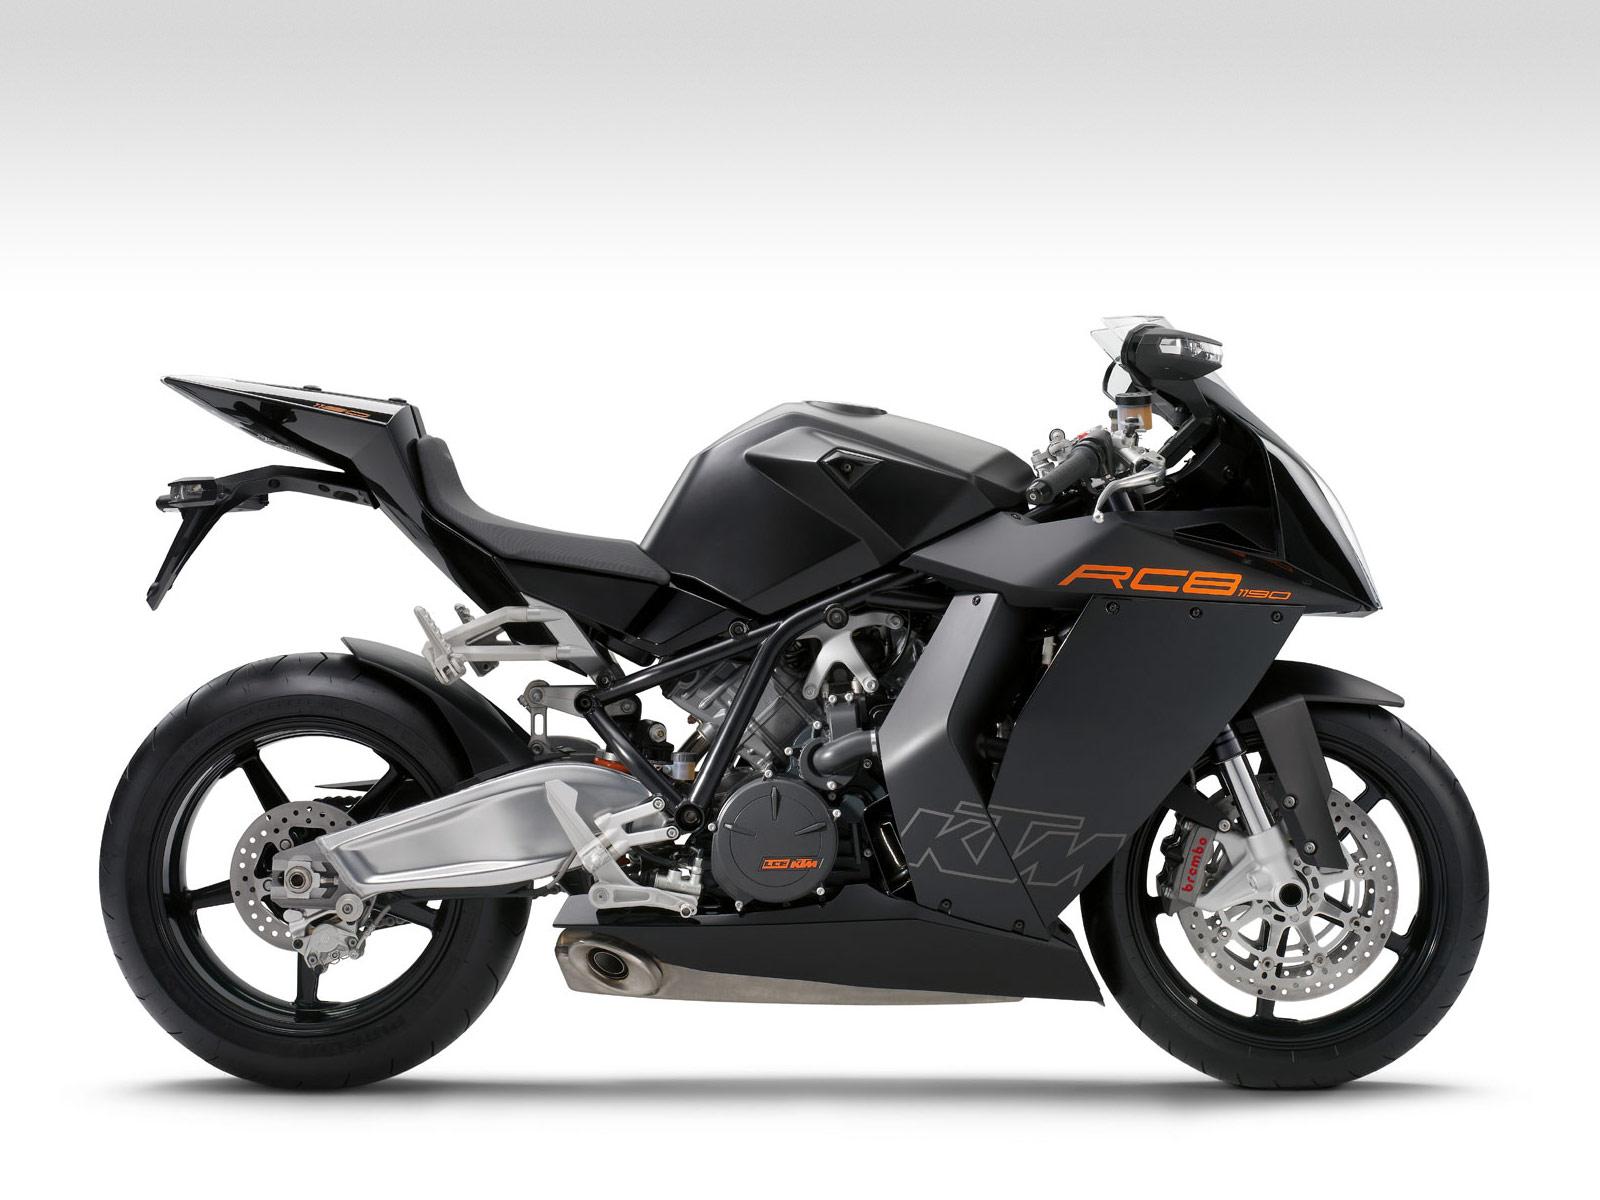 http://2.bp.blogspot.com/-_KyWvEGOUqY/Tn0u0jsKZBI/AAAAAAAABRg/ercFmzR4TVg/s1600/2010-KTM-1190RC8_motorcycle-desktop-wallpaper_1.jpg